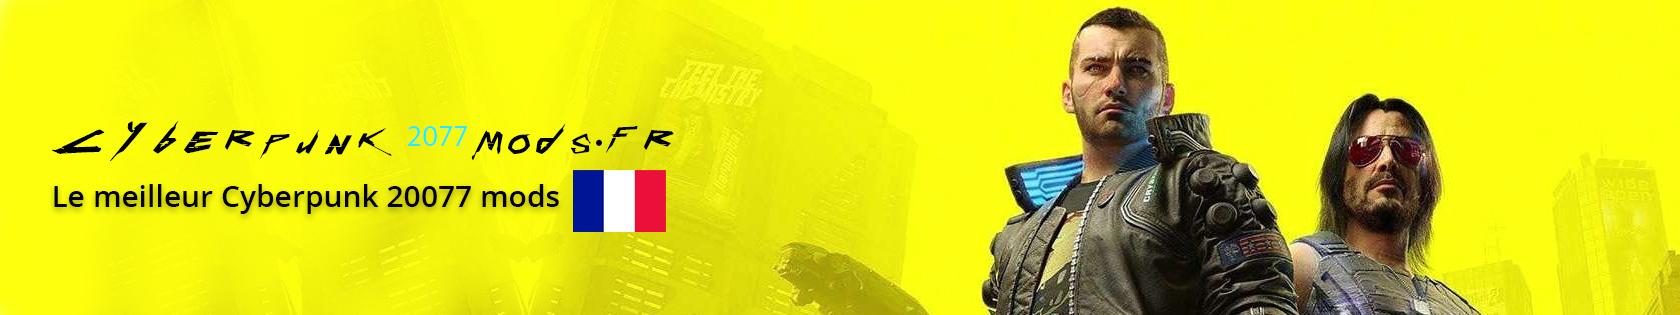 Cyberpunk 2077 mods | CP 2077 Mods